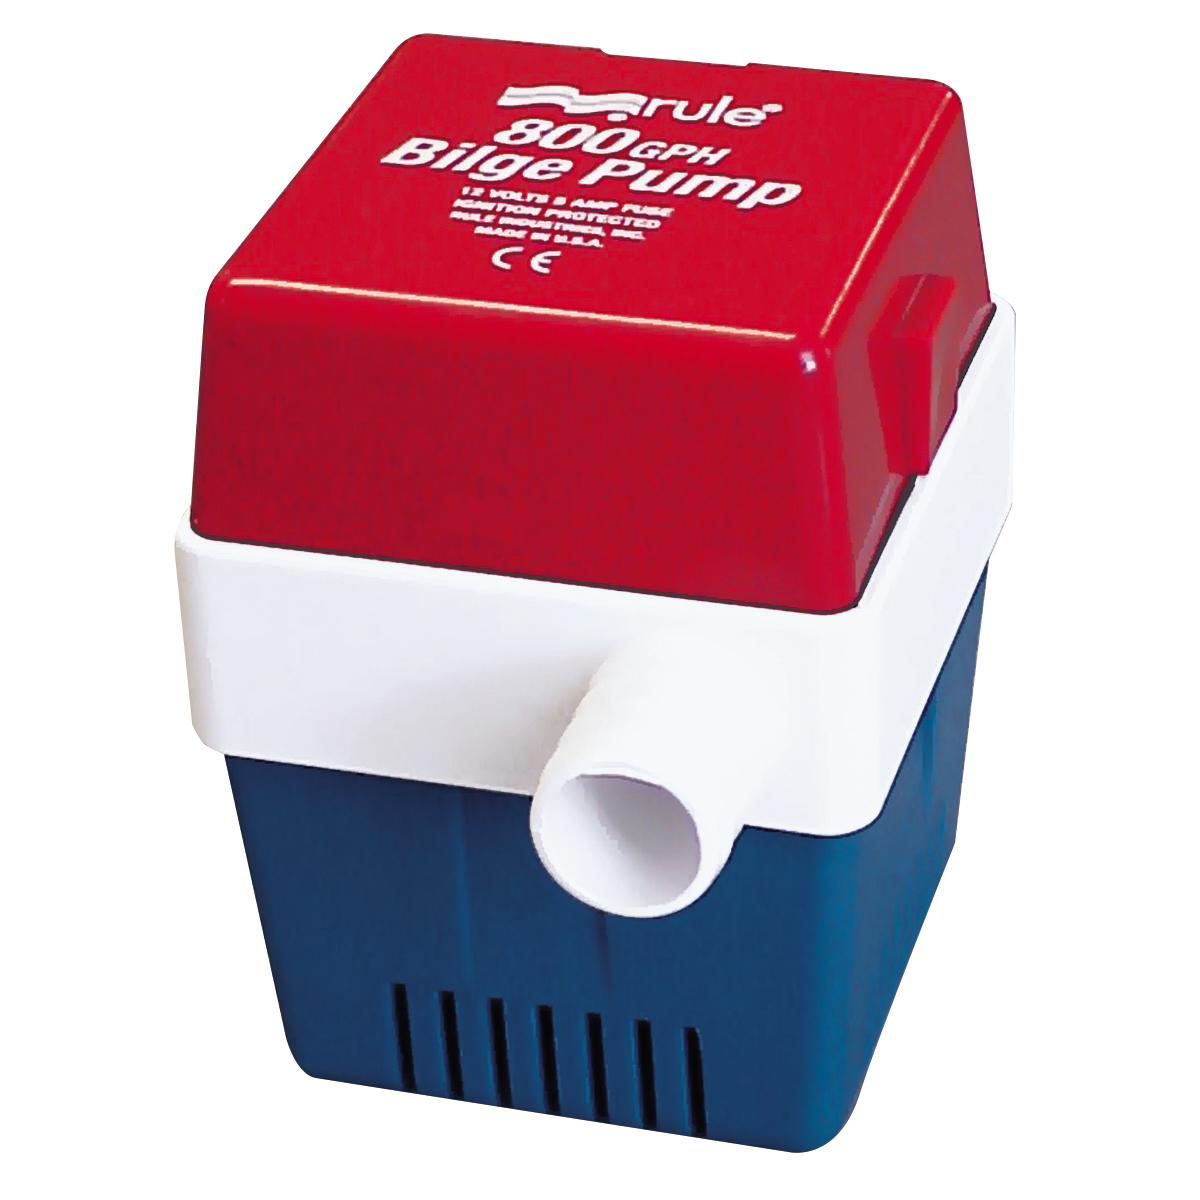 Rule Submersible Bilge Pump 20F - 800GPH